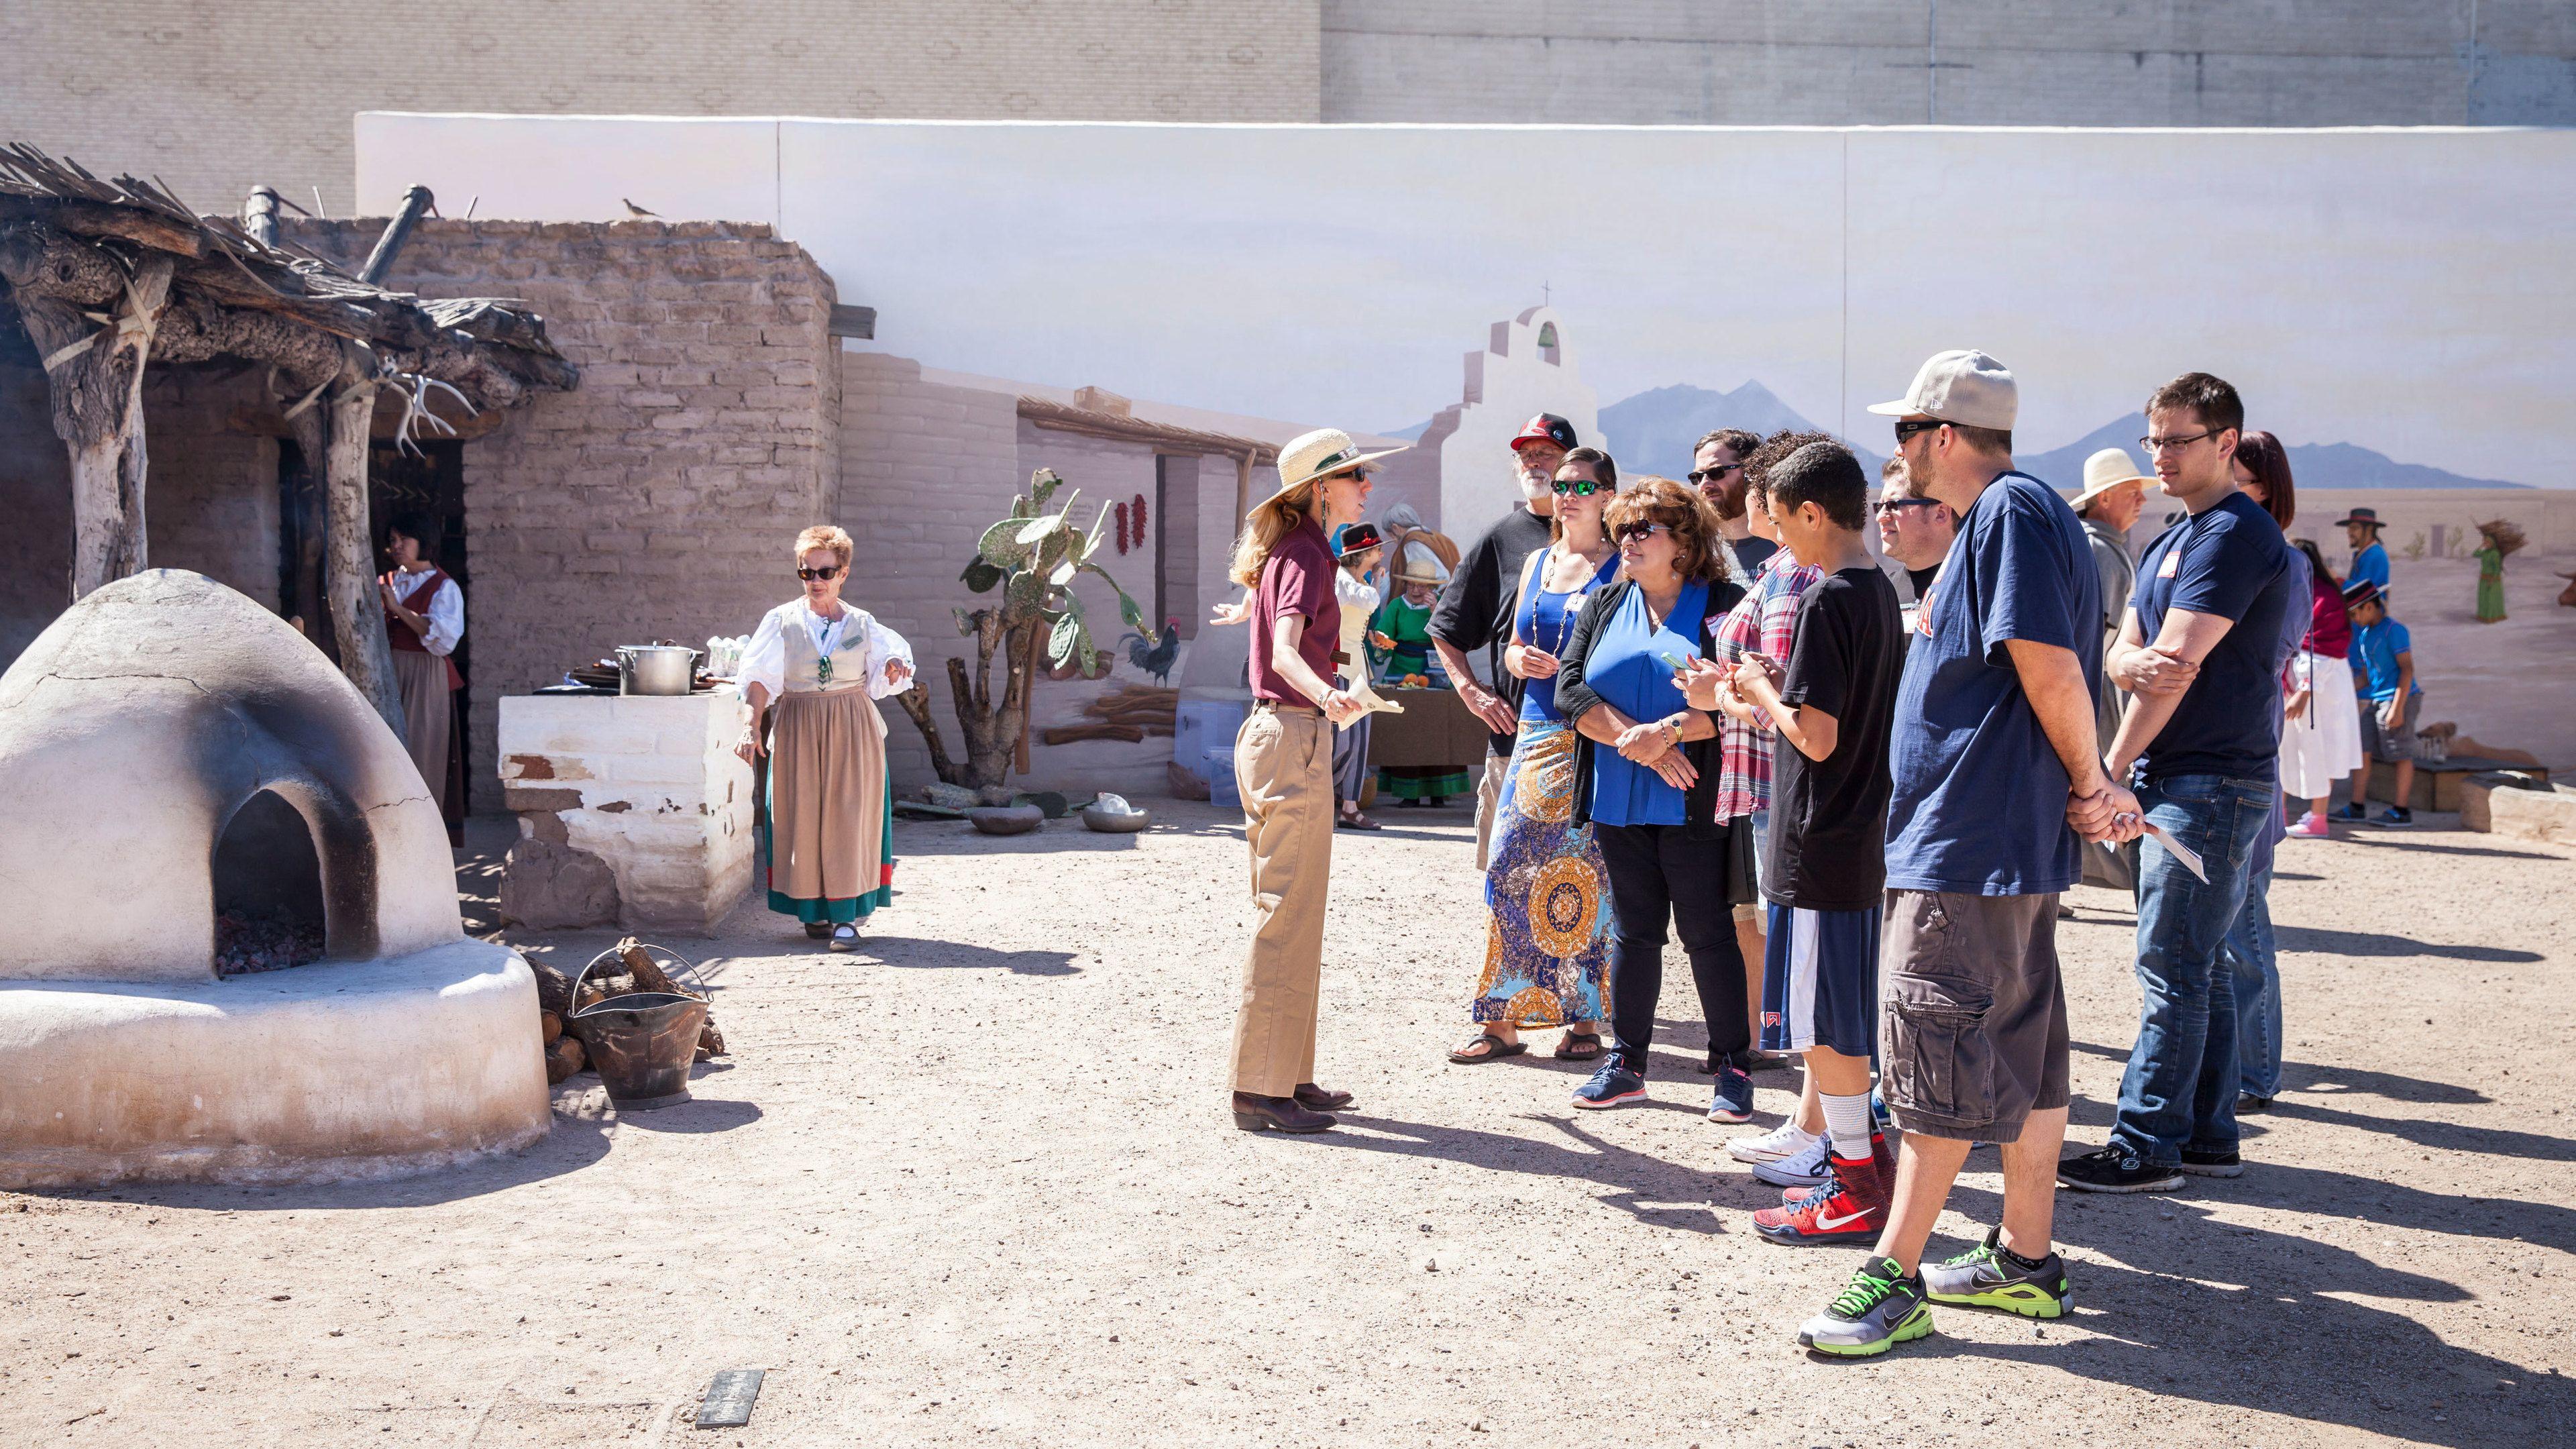 Tour guide leads group around Presidio San Agustín del Tucson Museum